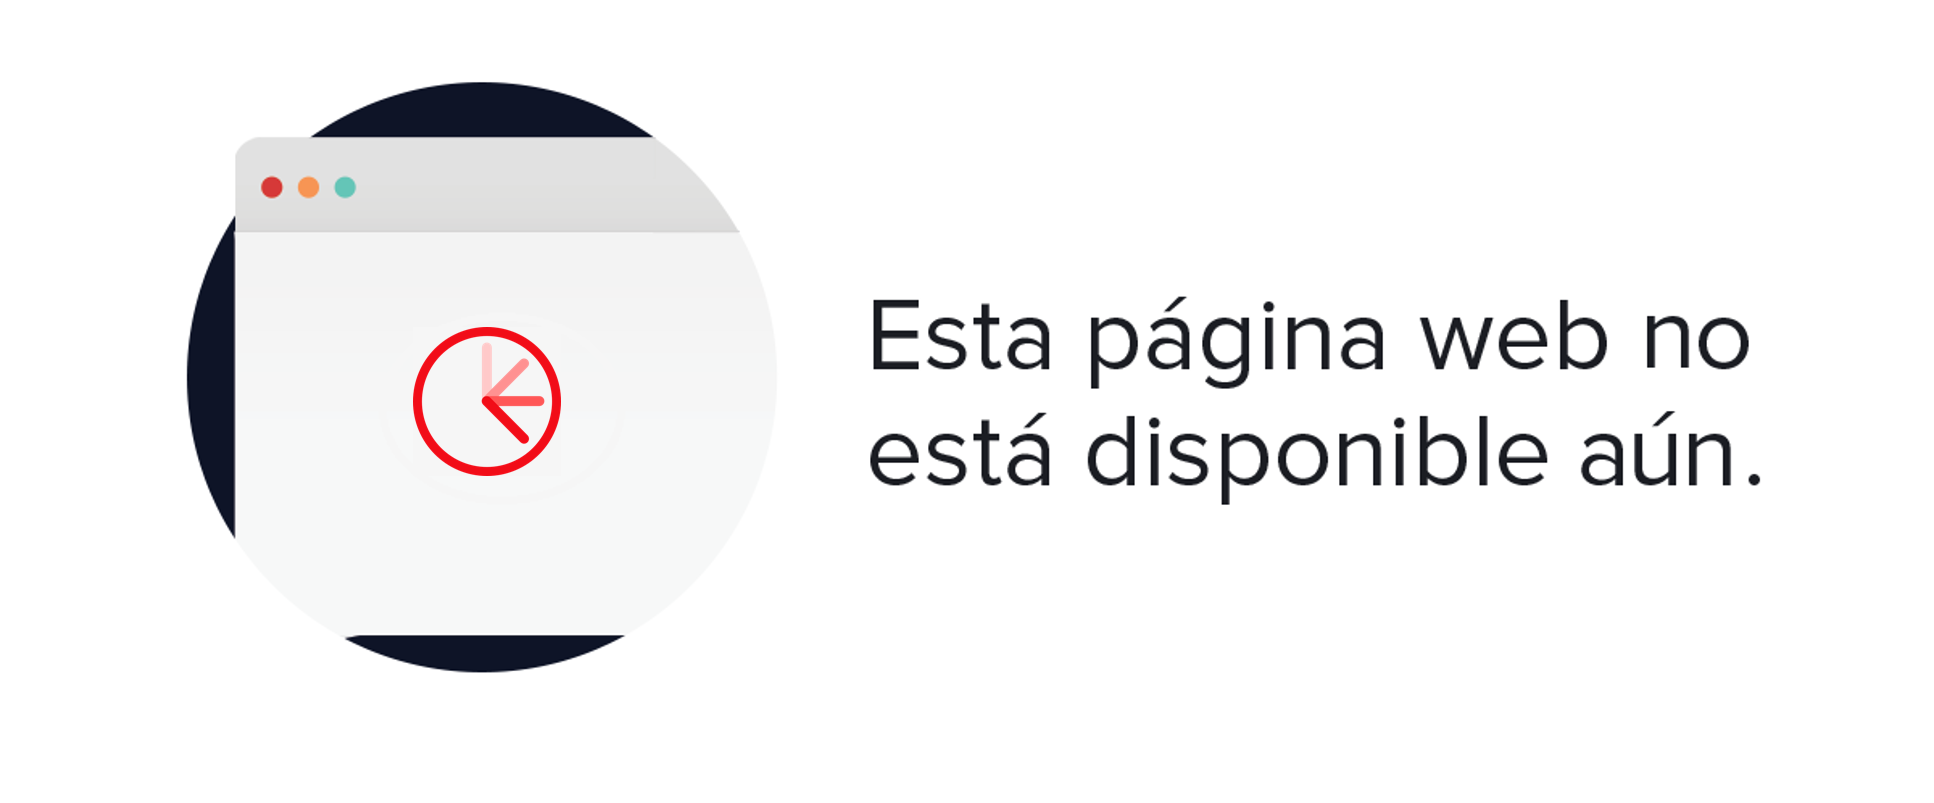 Camiseta Piedra Papel Tijera Lagarto Spock Cuello ancho & Loose Fit 9P1P00P9